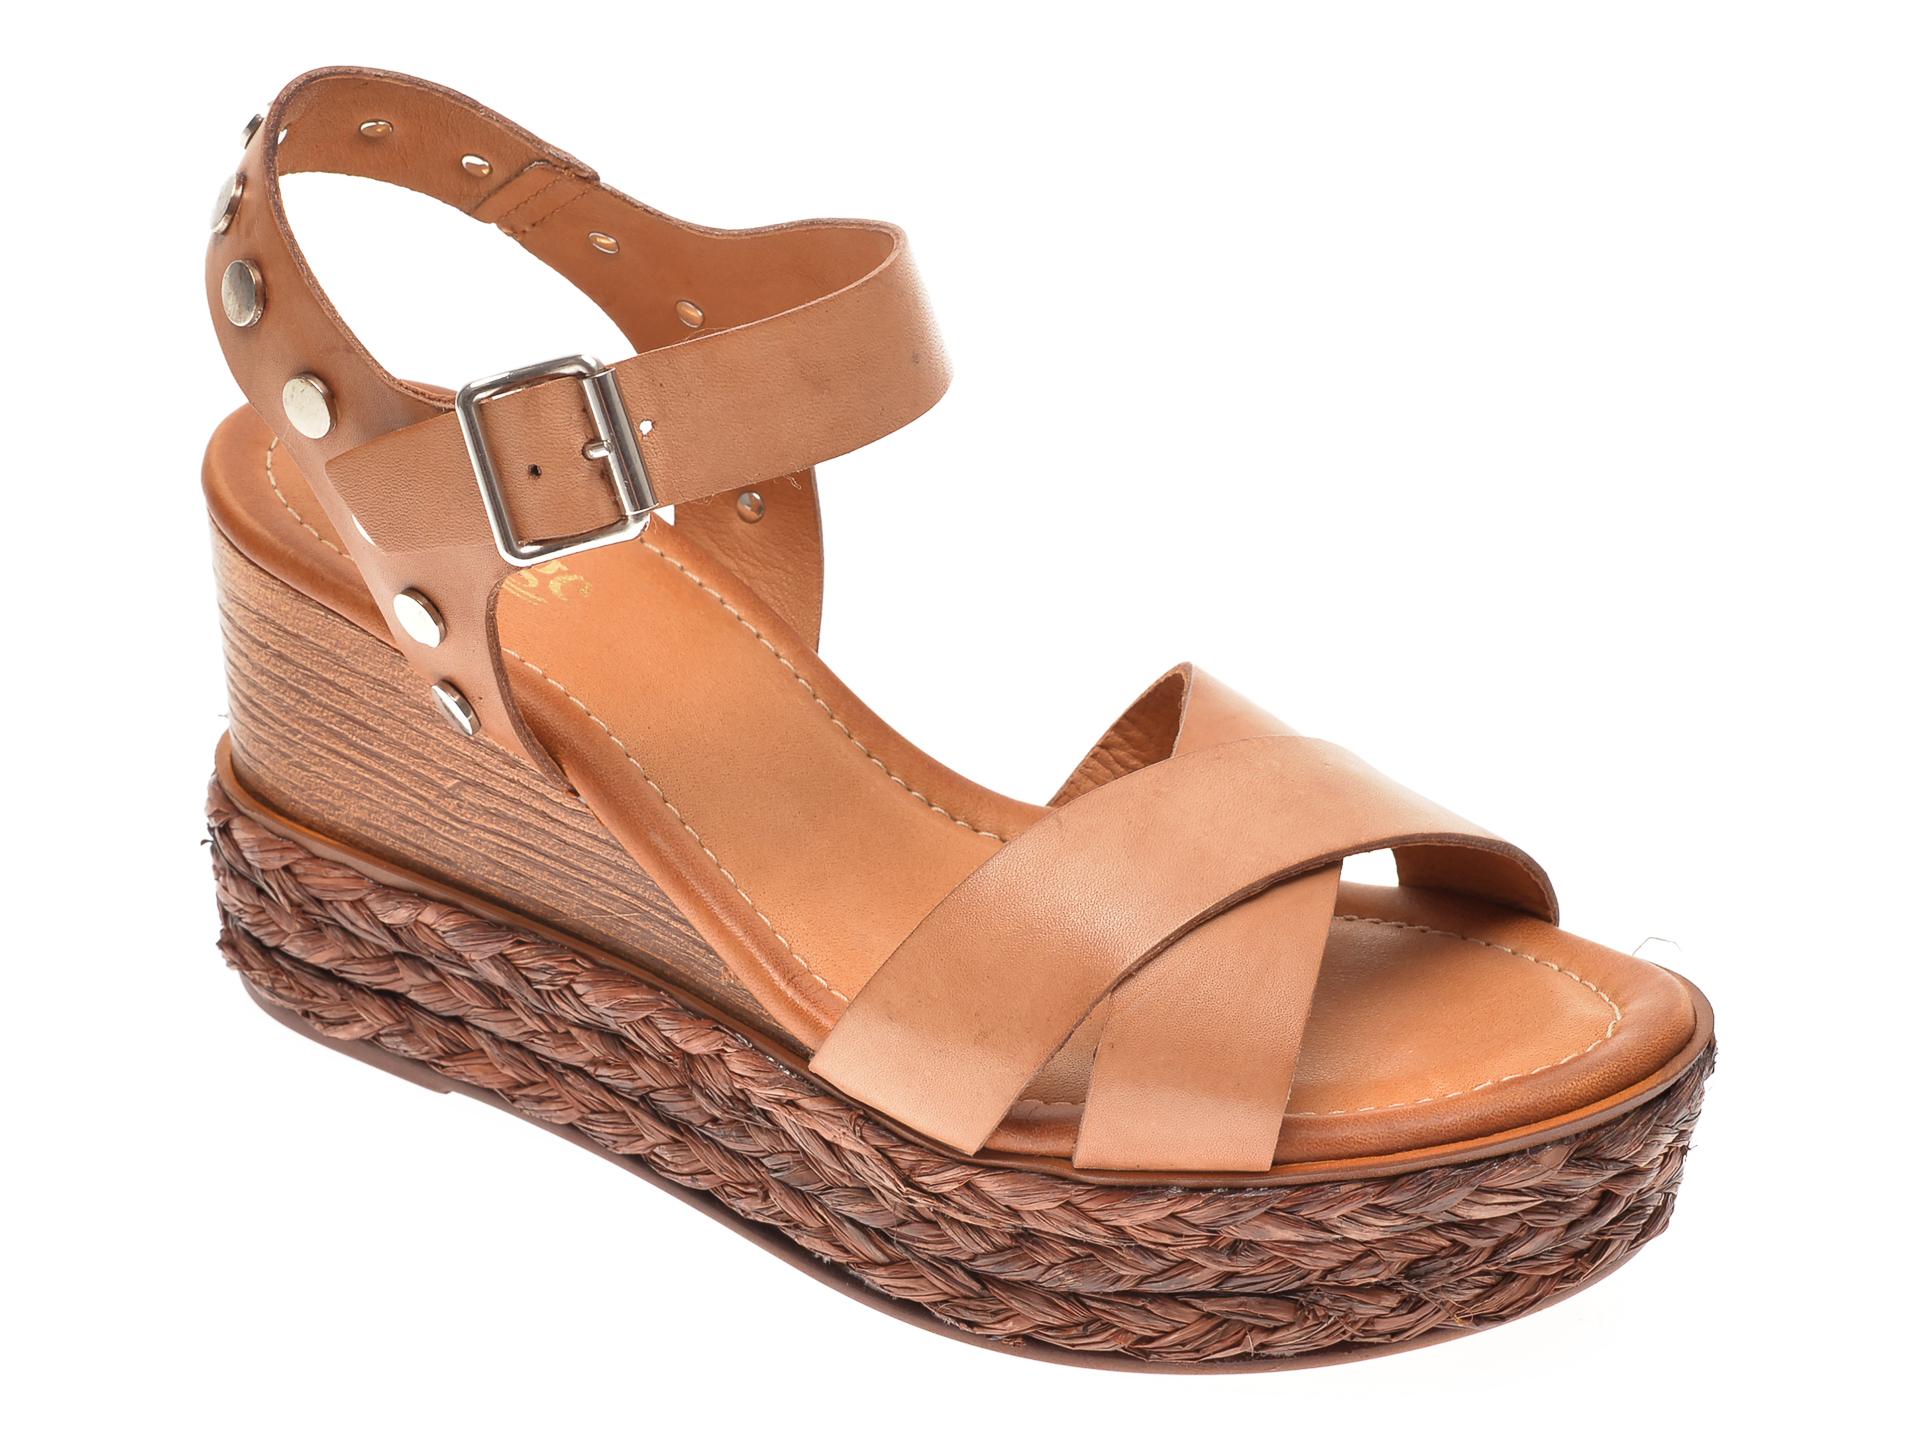 Sandale IMAGE maro, 4147, din piele naturala